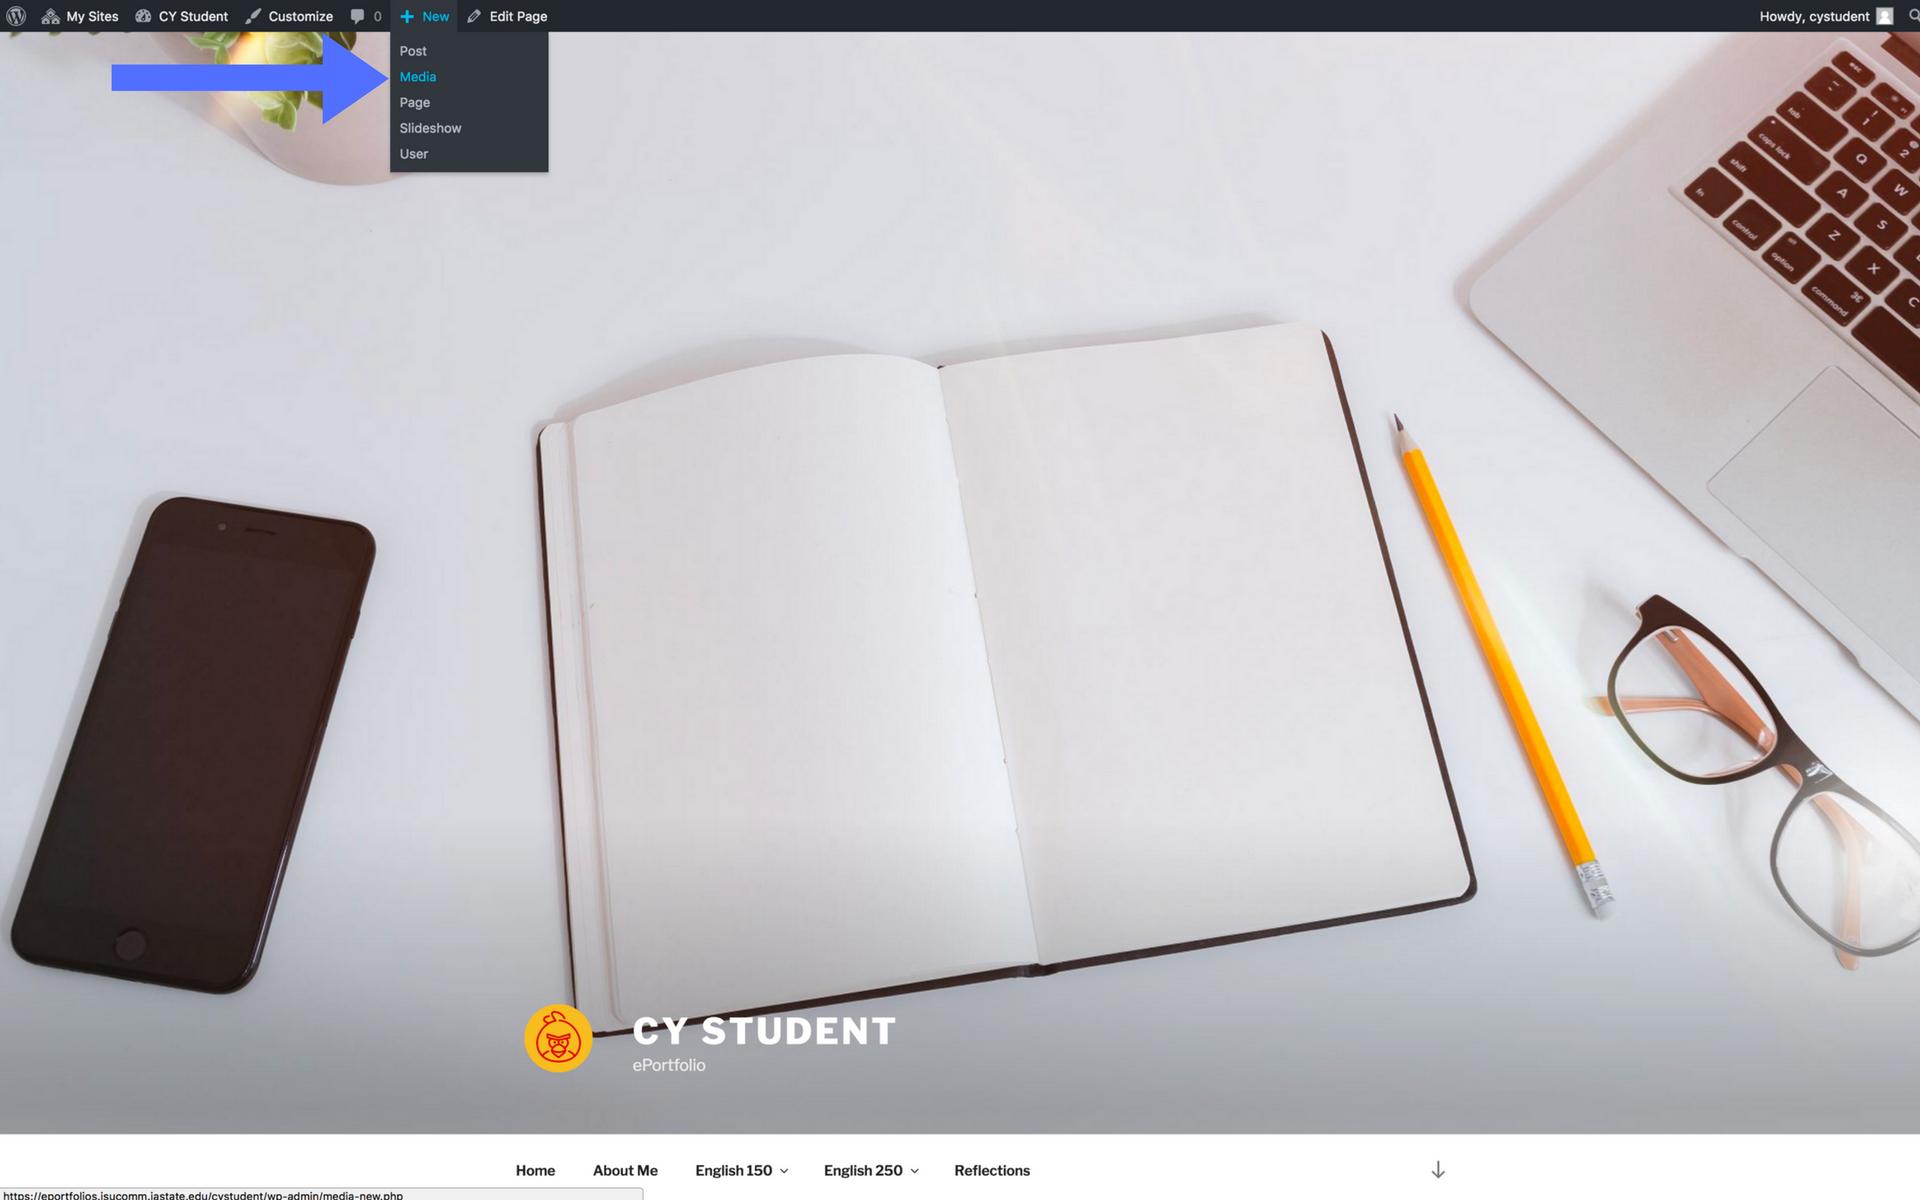 Adding images screenshot step 1